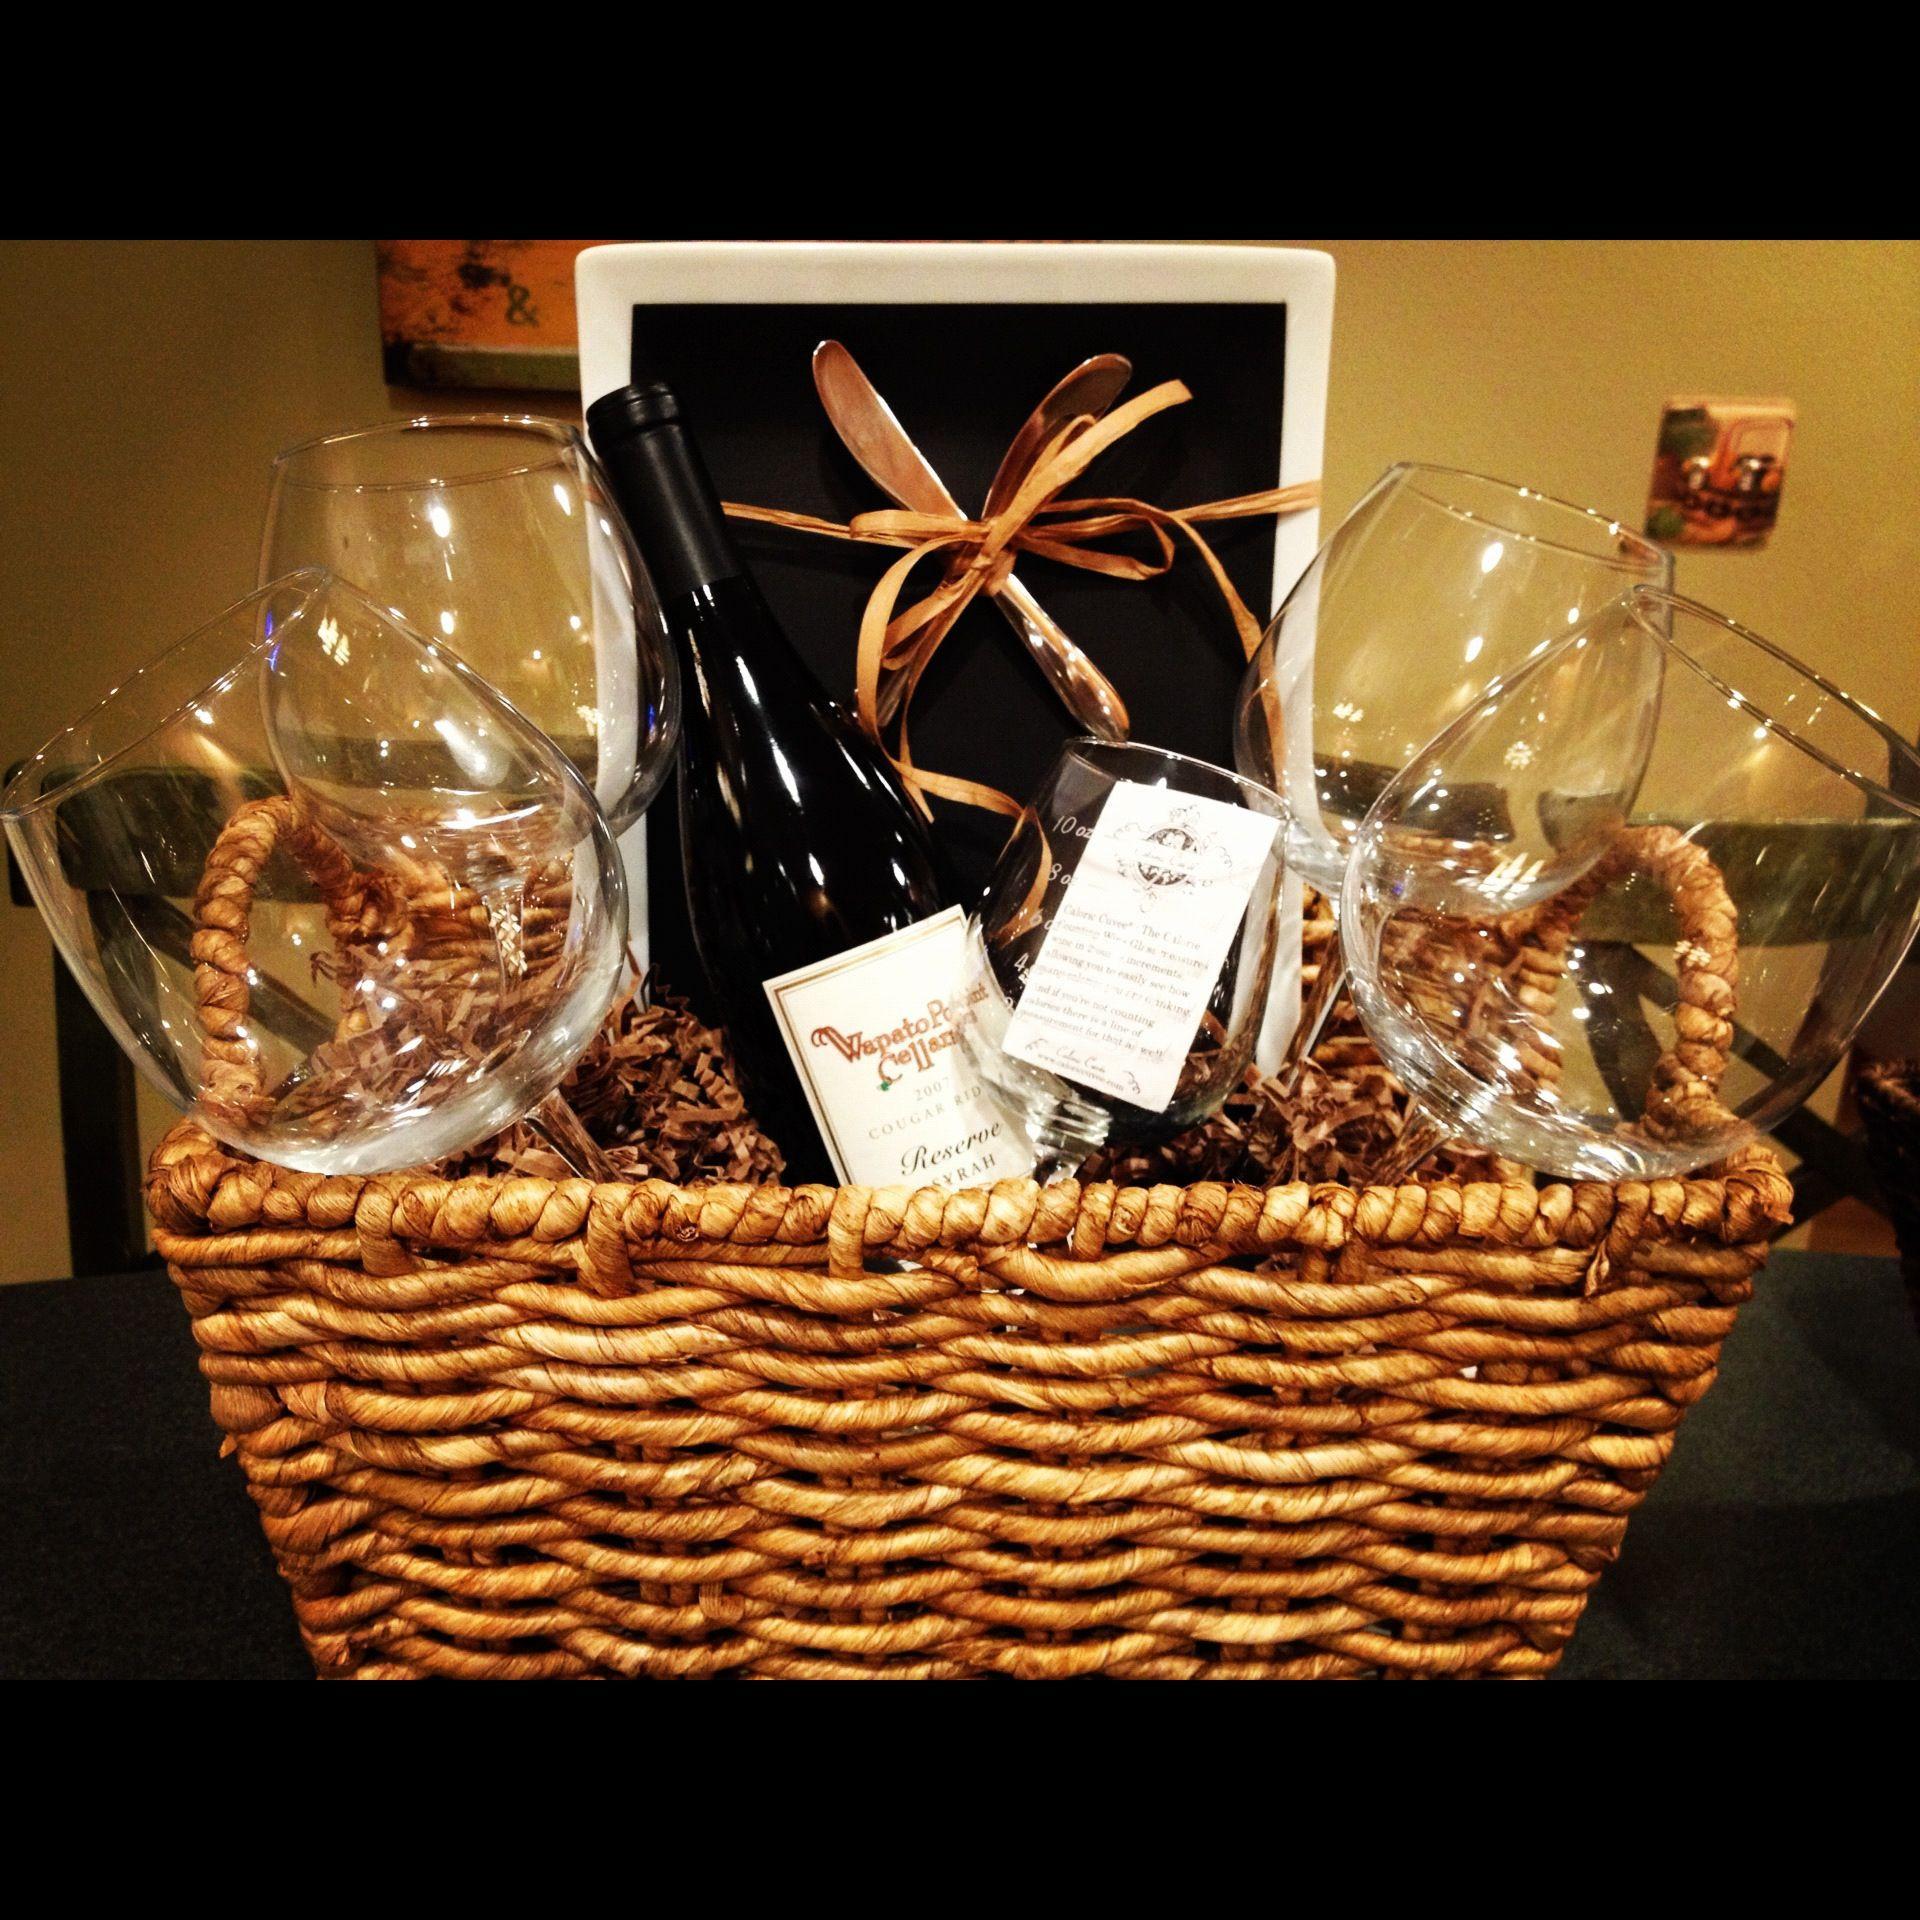 Wine Basket Gift Ideas  DIY wine t basket for shower throwers 1 or 2 bottles